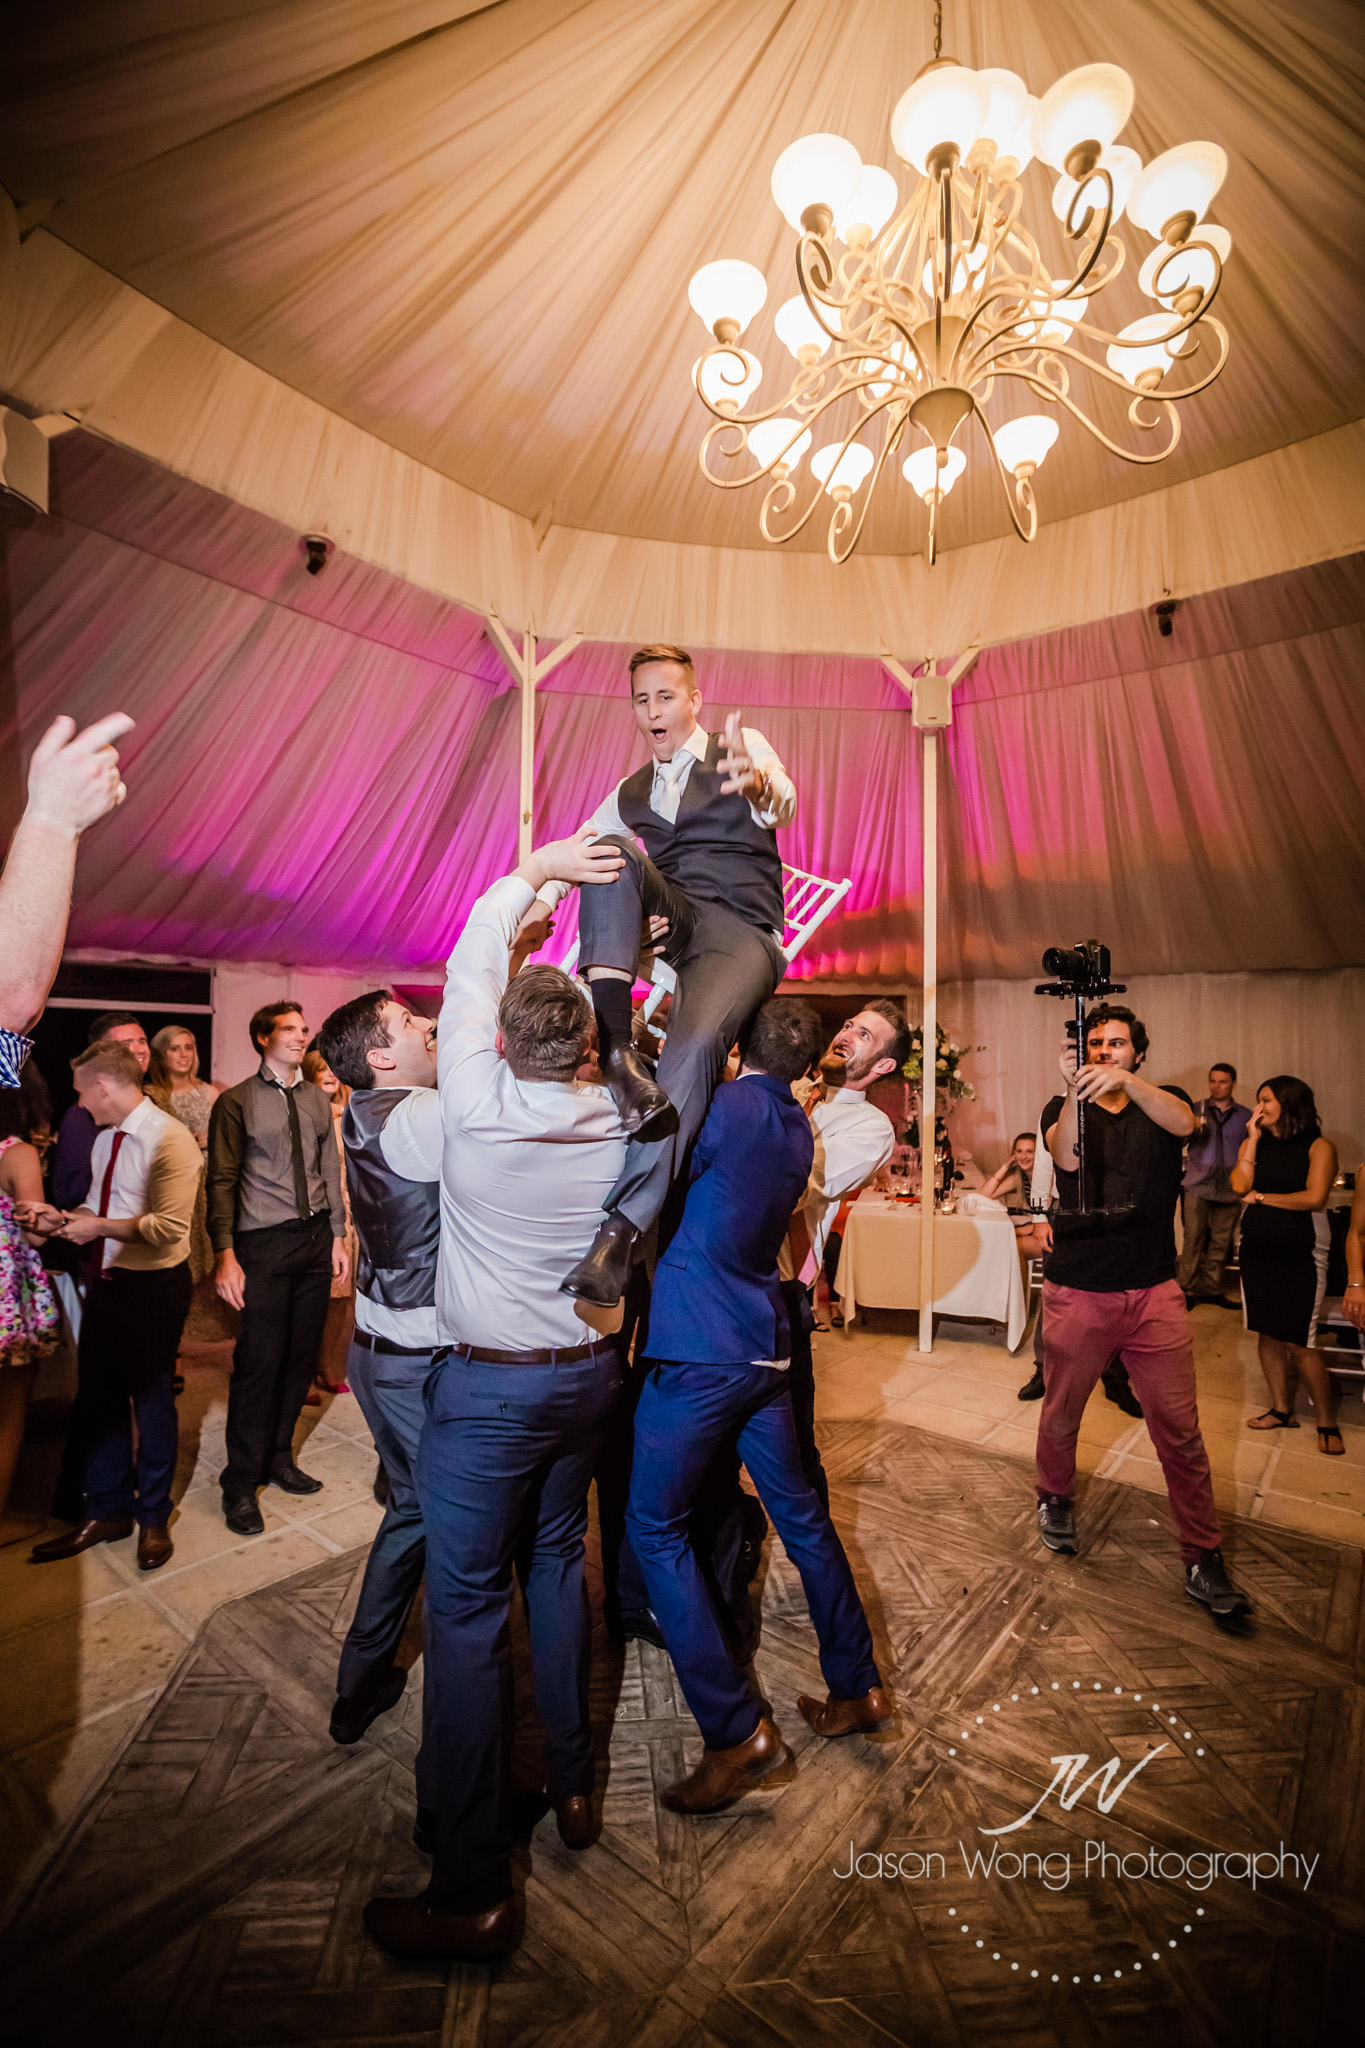 reception-fun-groom-getting-carry.jpg